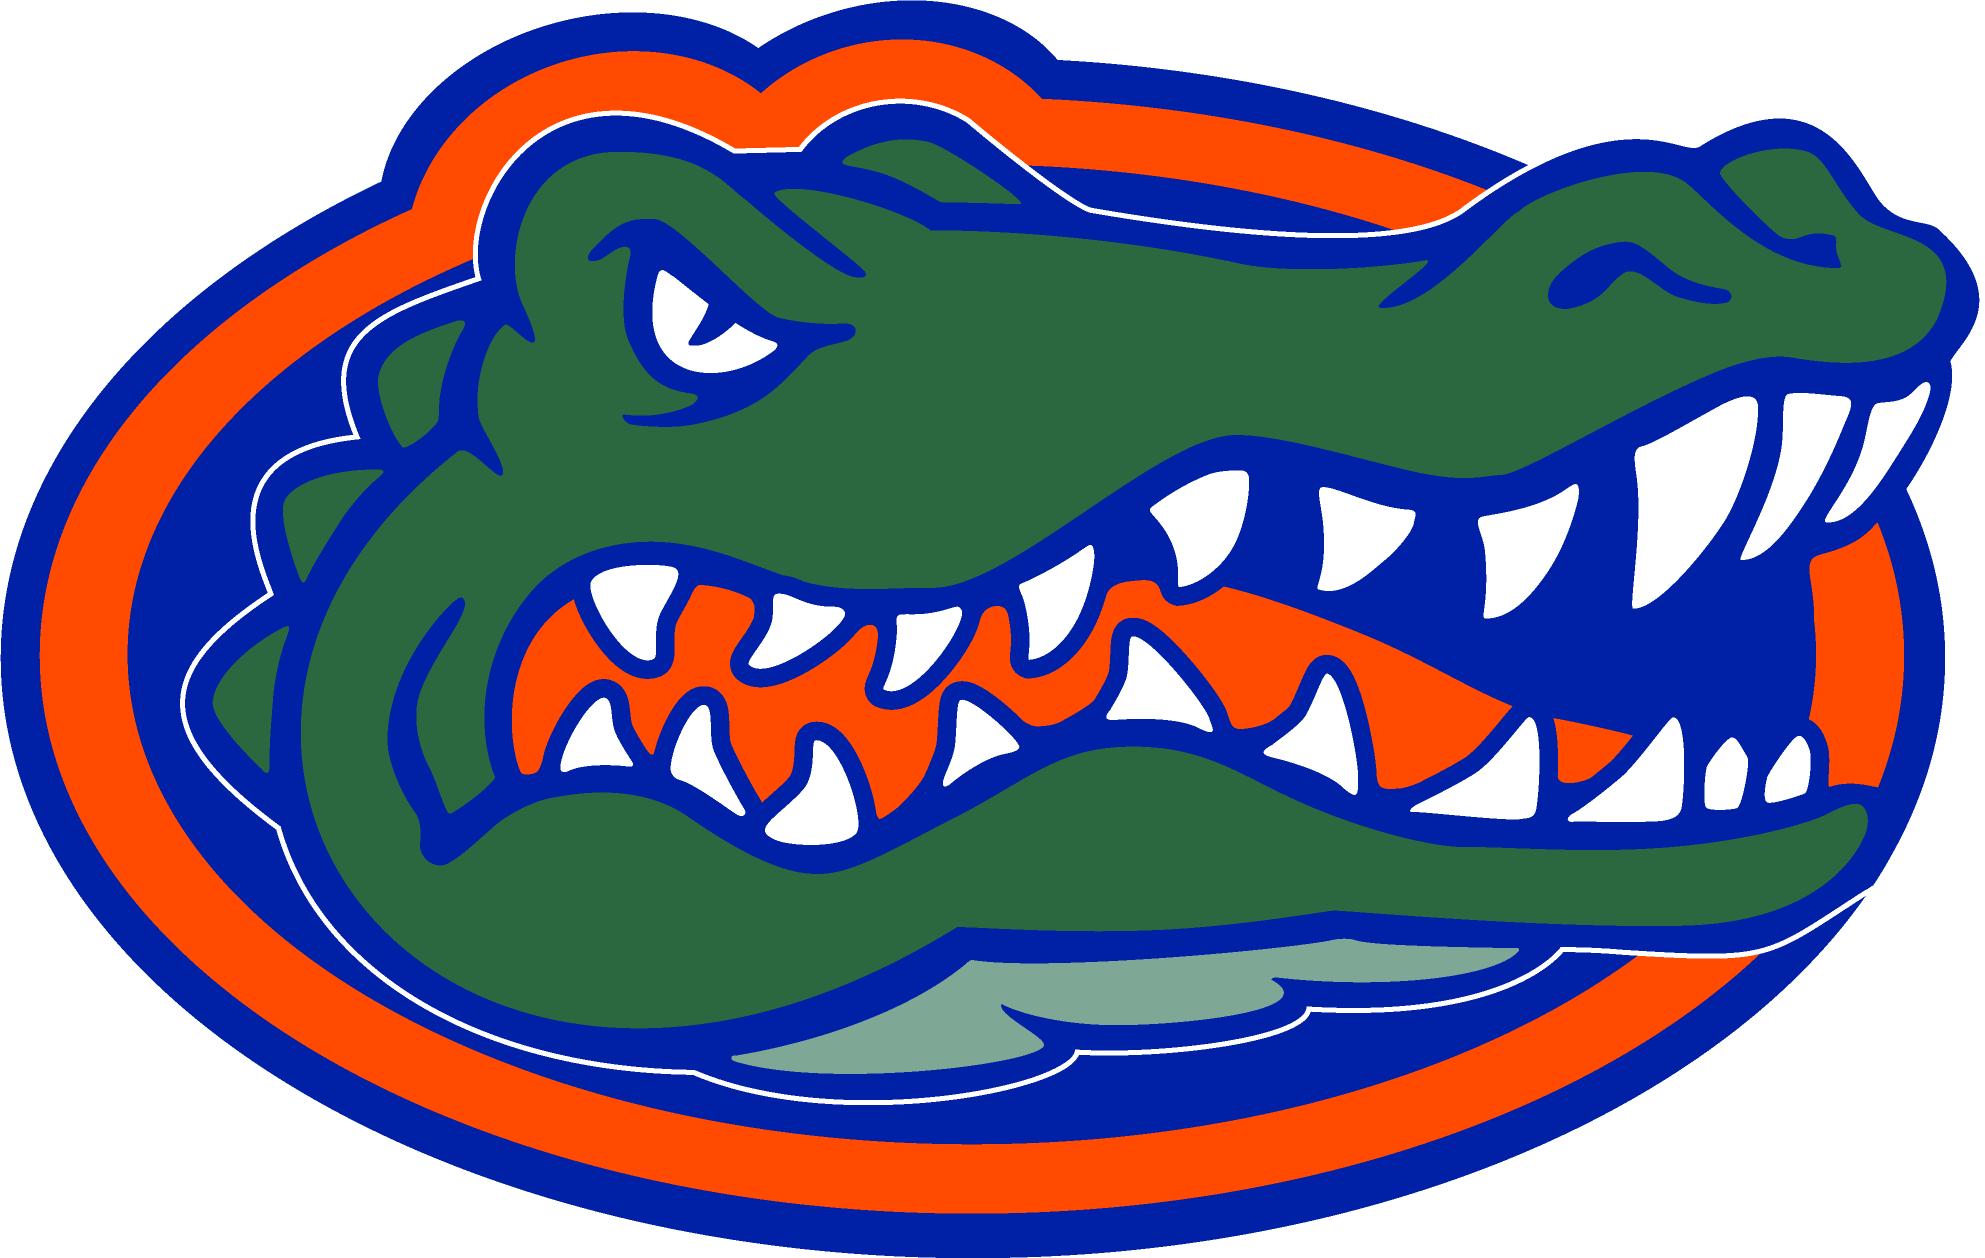 Images For Gt University Of Florida Logo Vector Florida Gators Football Wallpaper Florida Gators Florida Gators Wallpaper